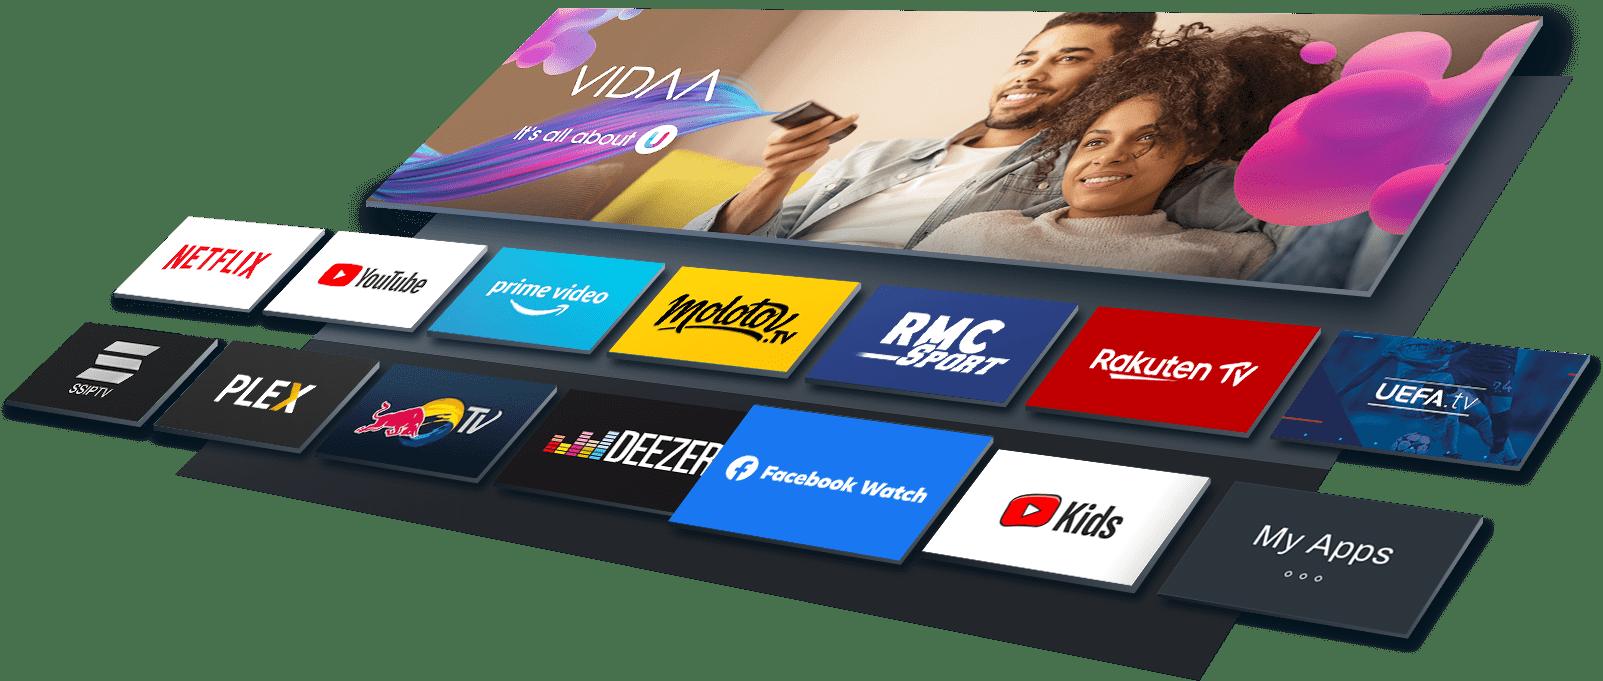 10-vidaa-TV Screen